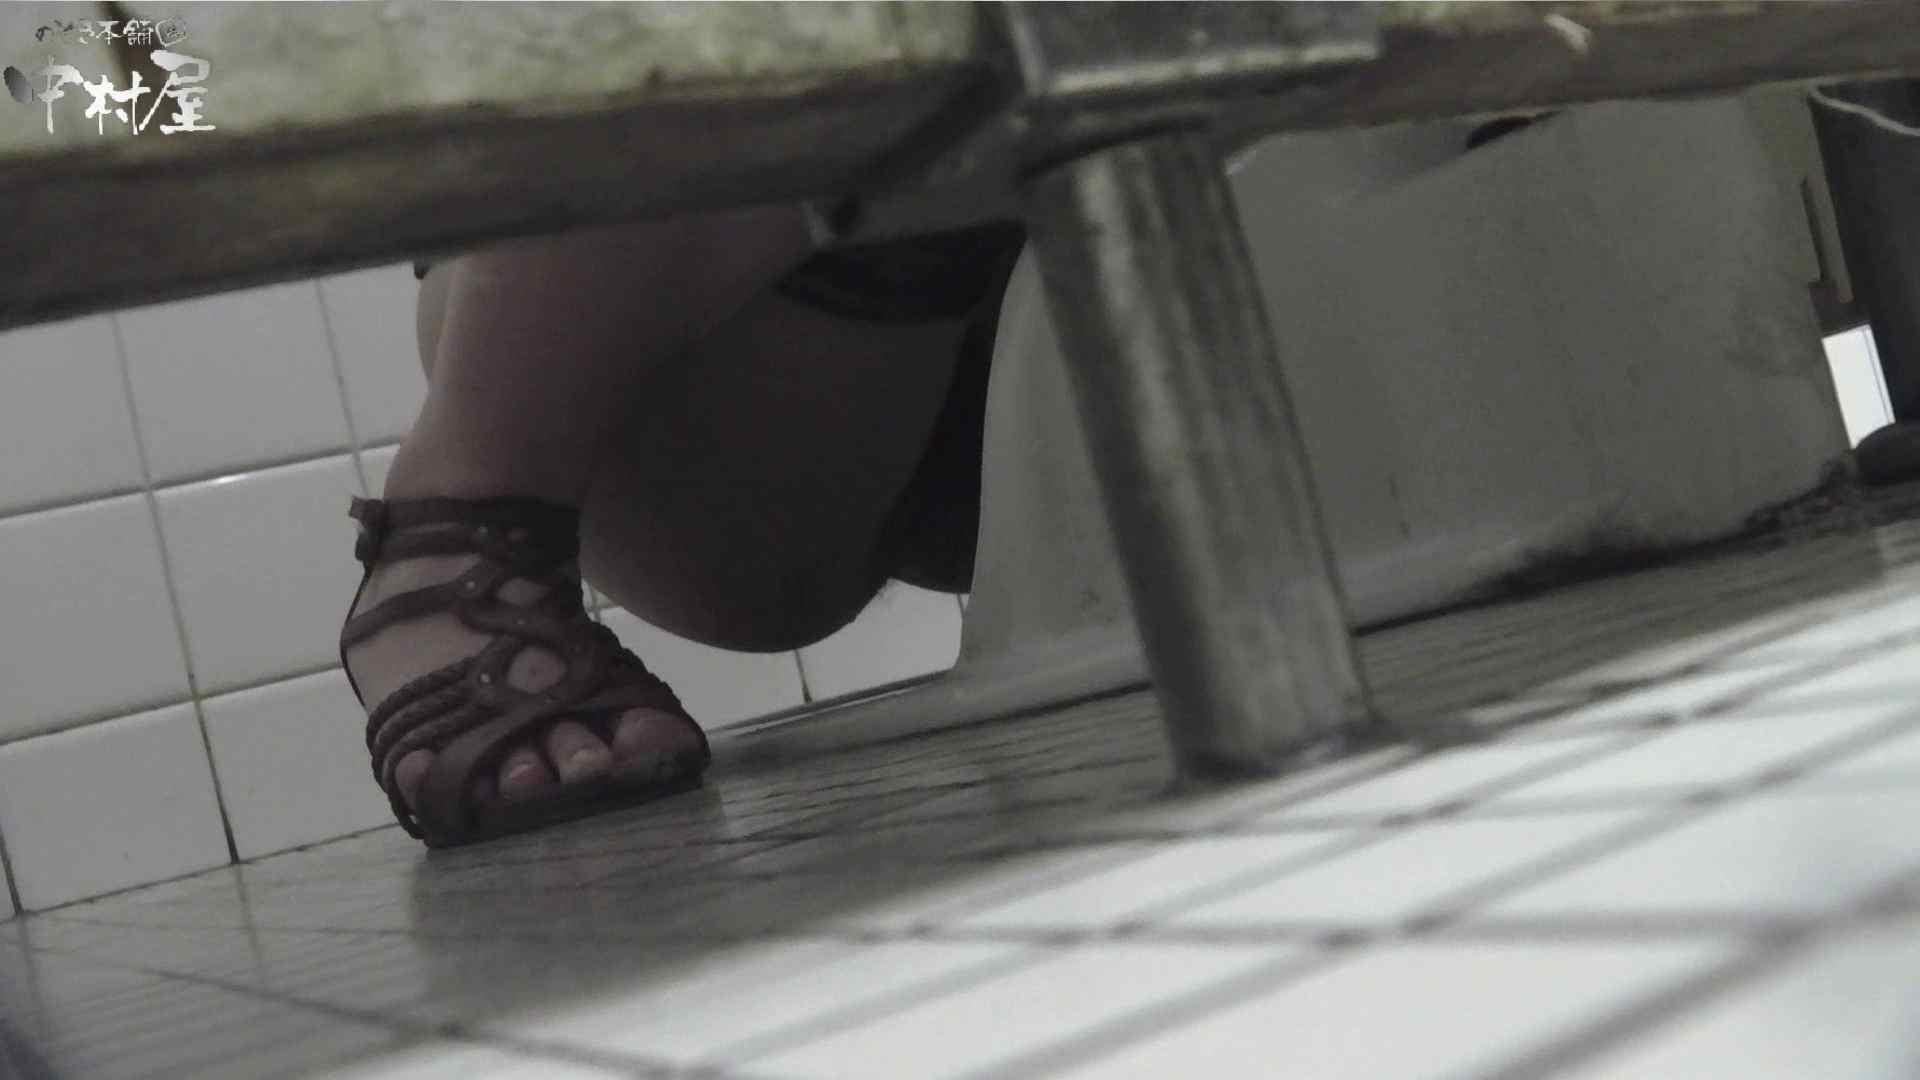 vol.42 命がけ潜伏洗面所! カカト上げながら・硬度強(太)・180g 潜入 | プライベート  101PIX 58